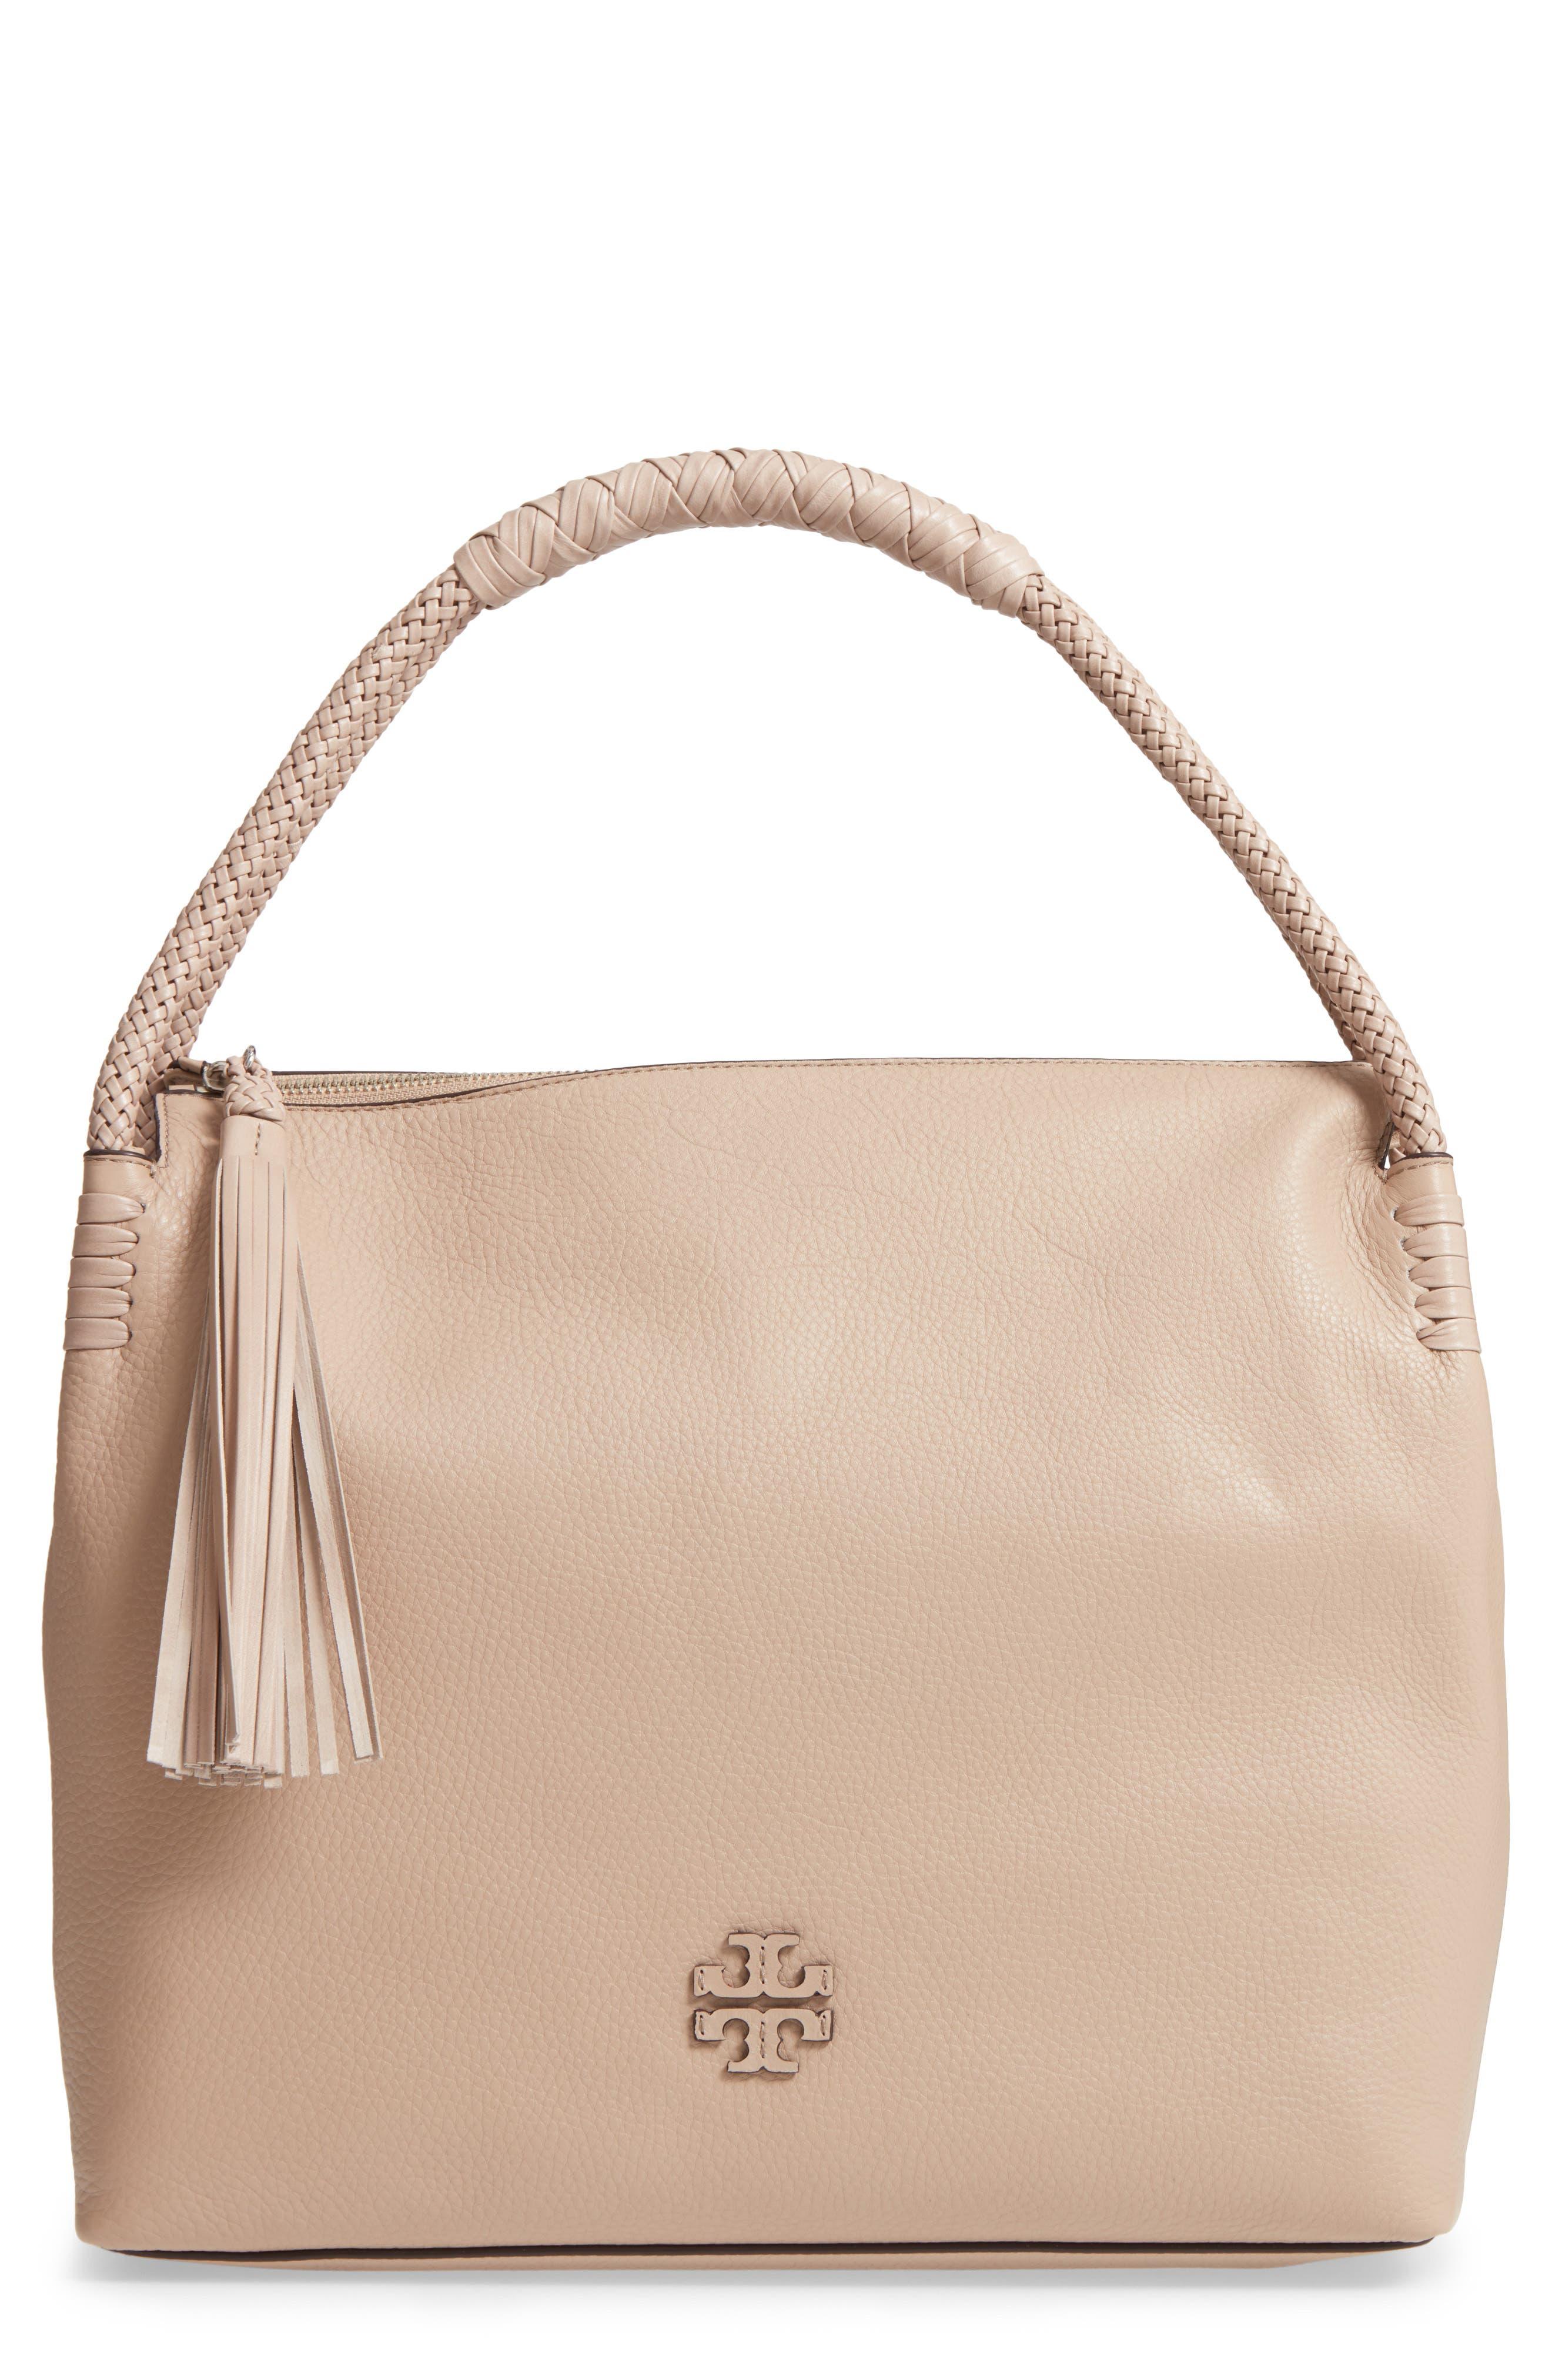 Hobo Bags & Purses | Nordstrom